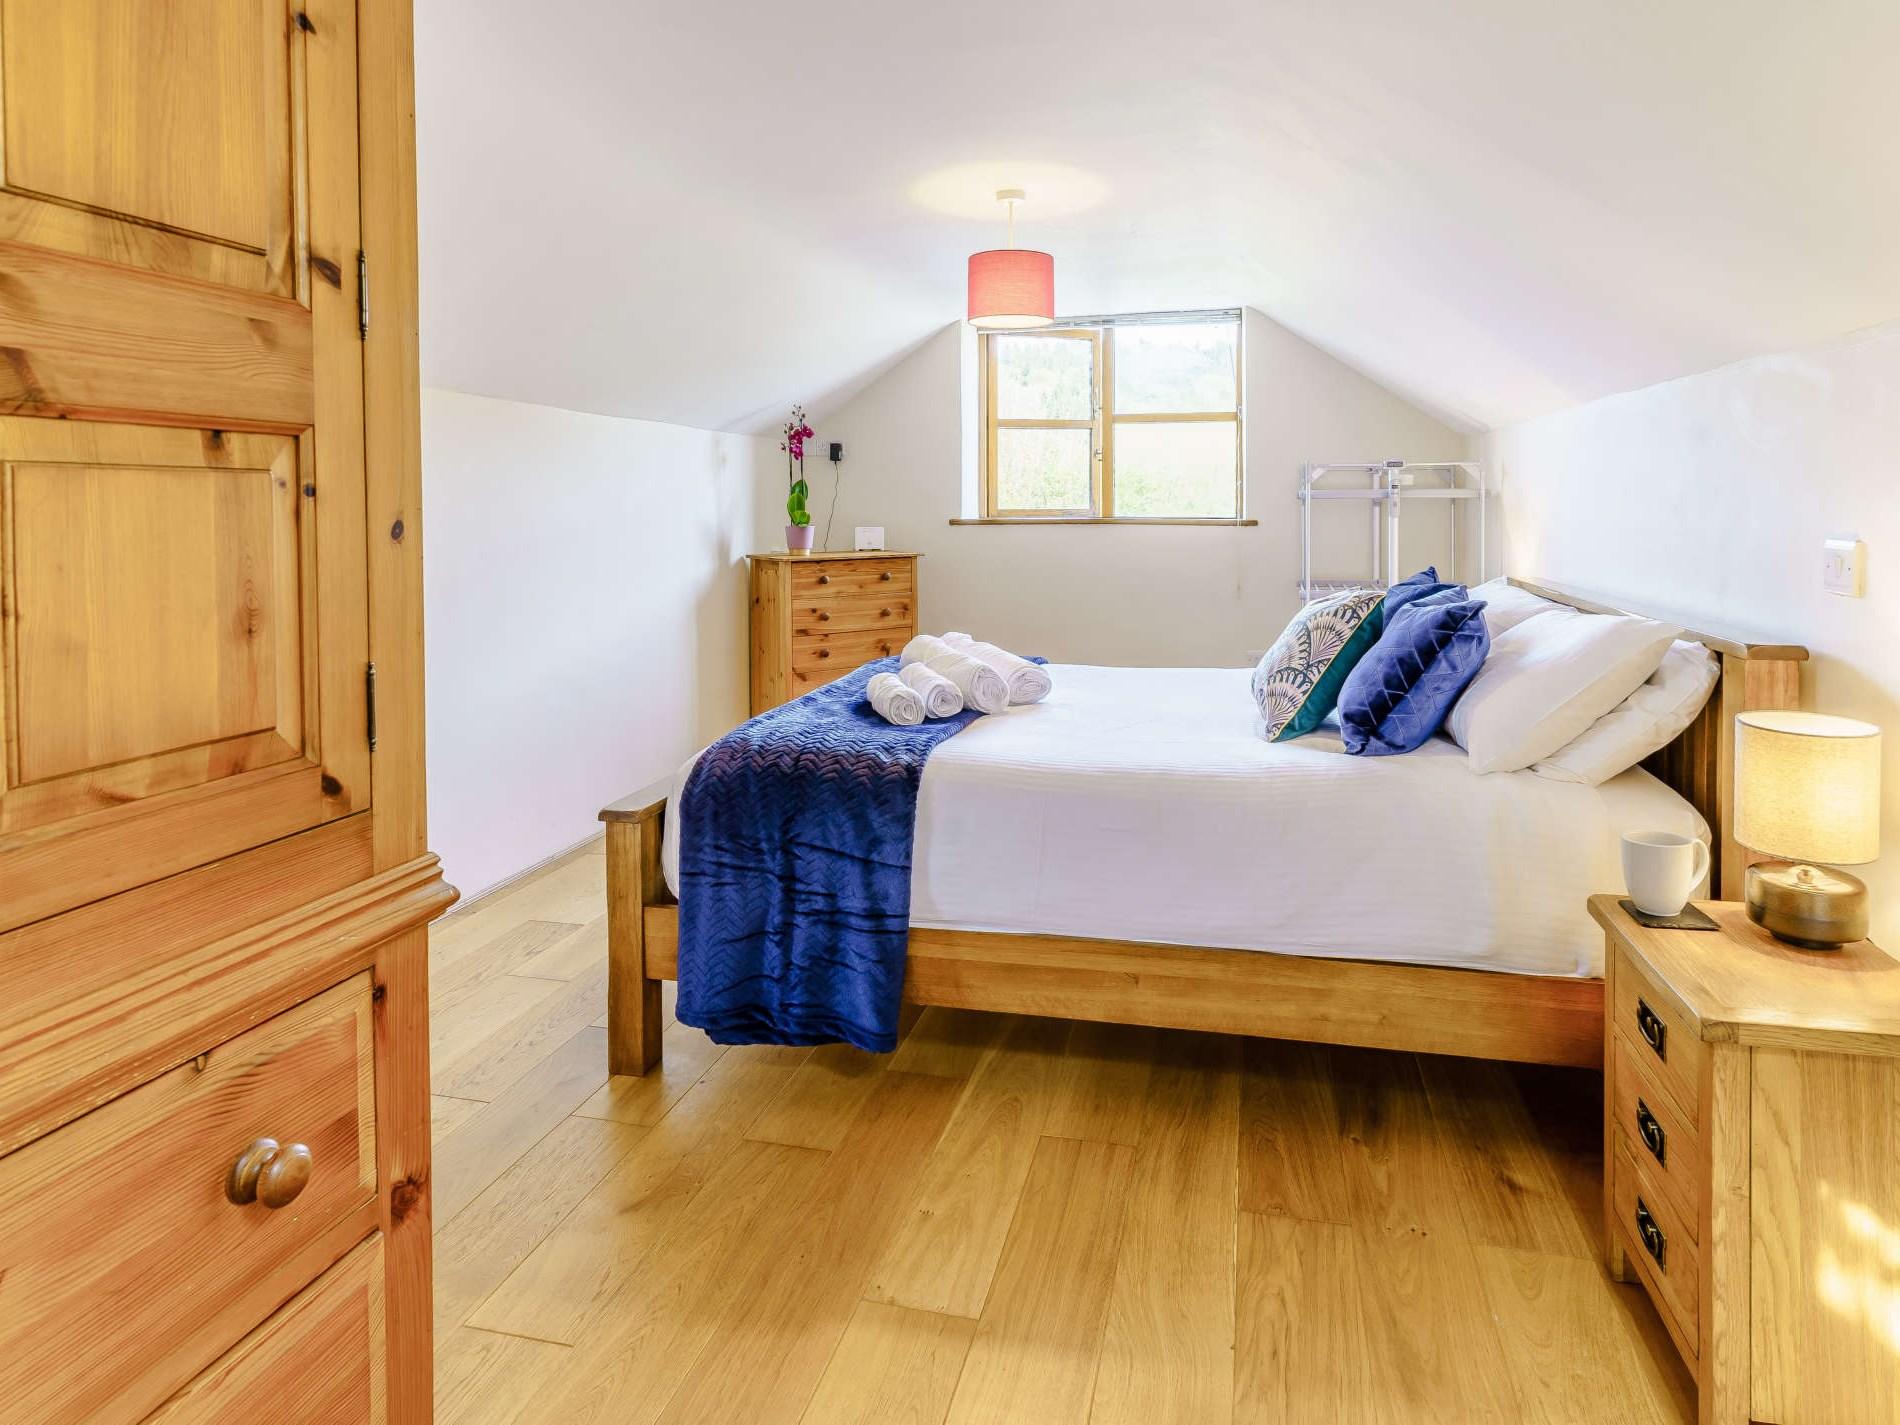 2 Bedroom Cottage in Aberaeron, Mid Wales